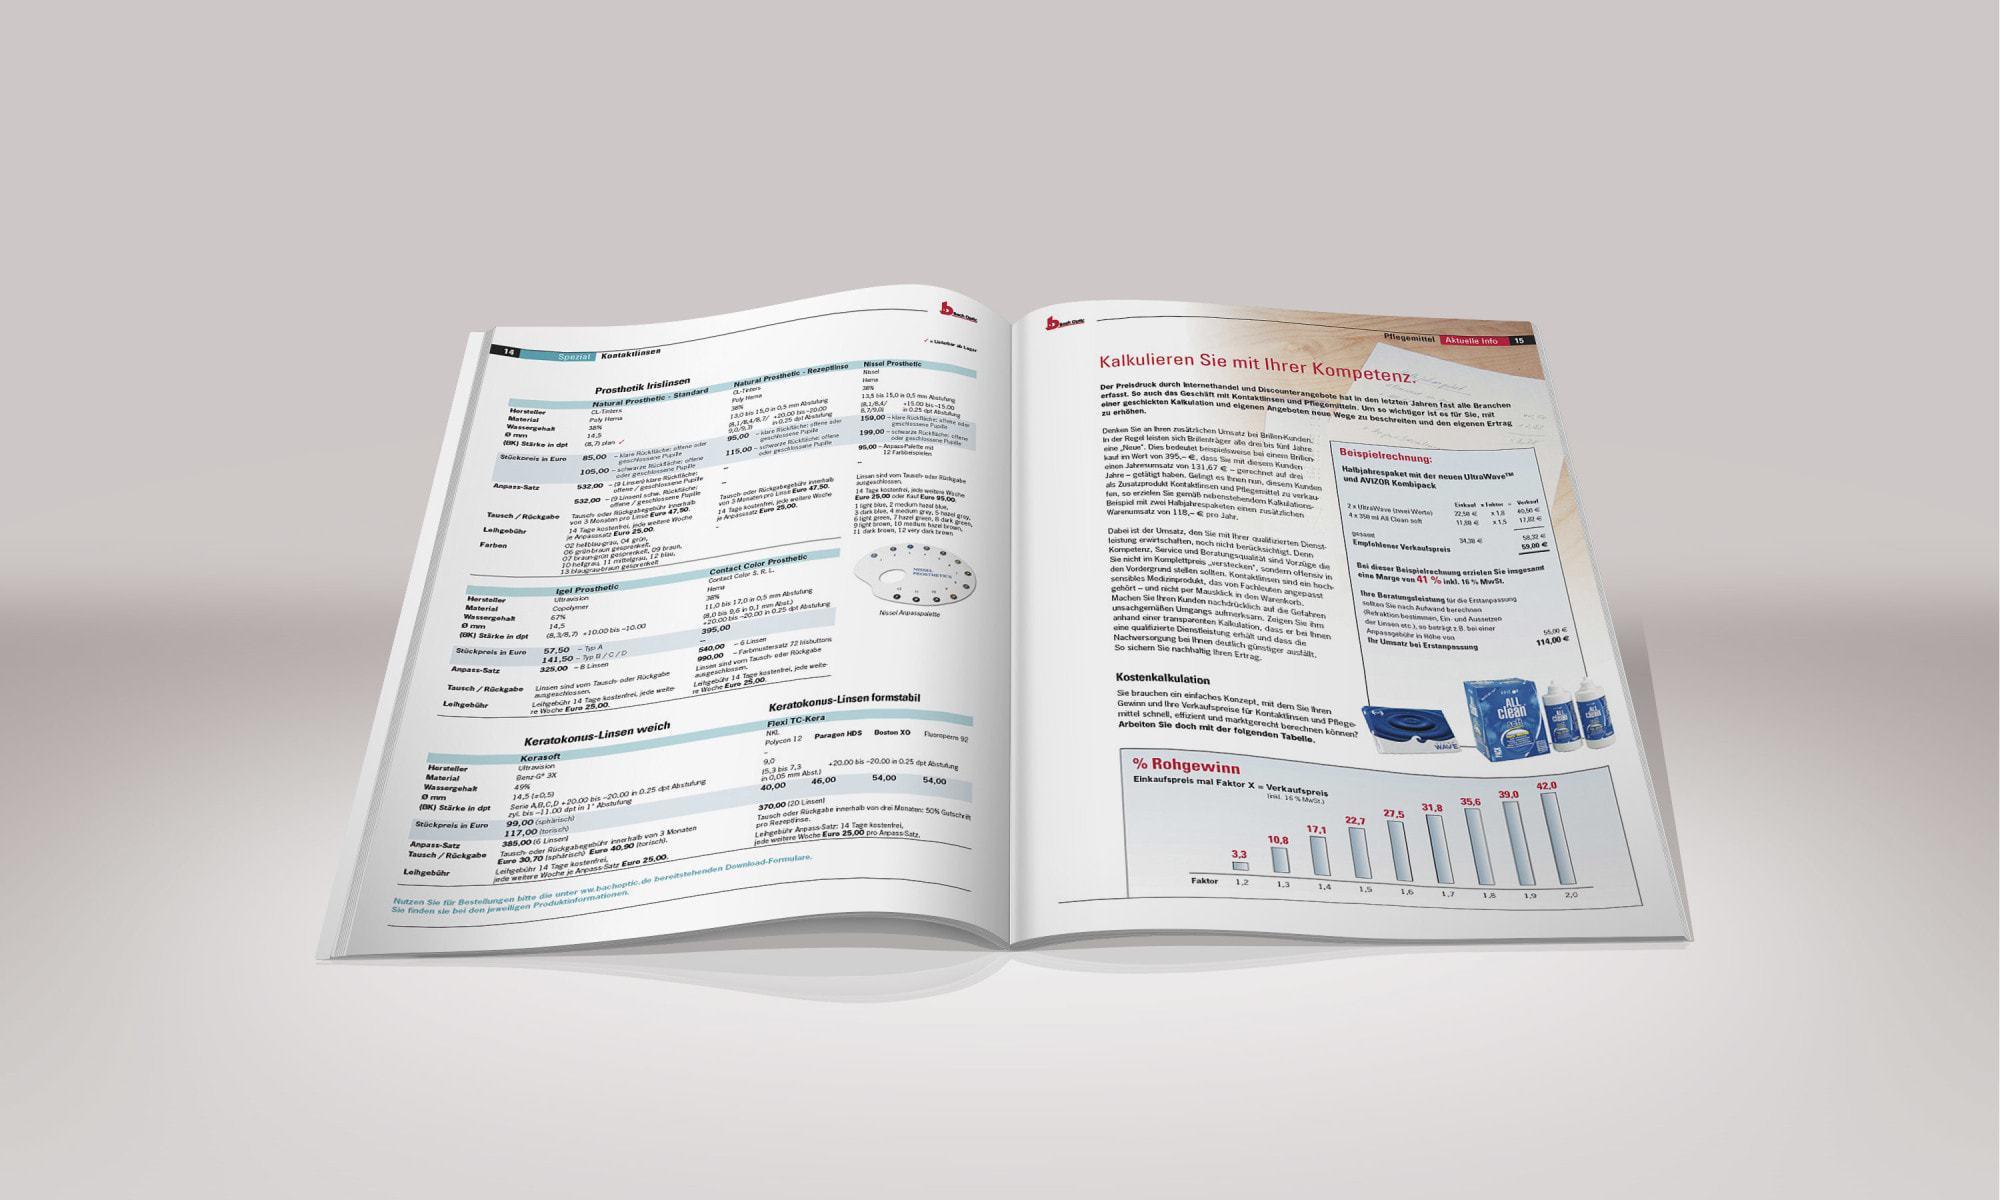 Bach Optik – Katalog und Preisliste